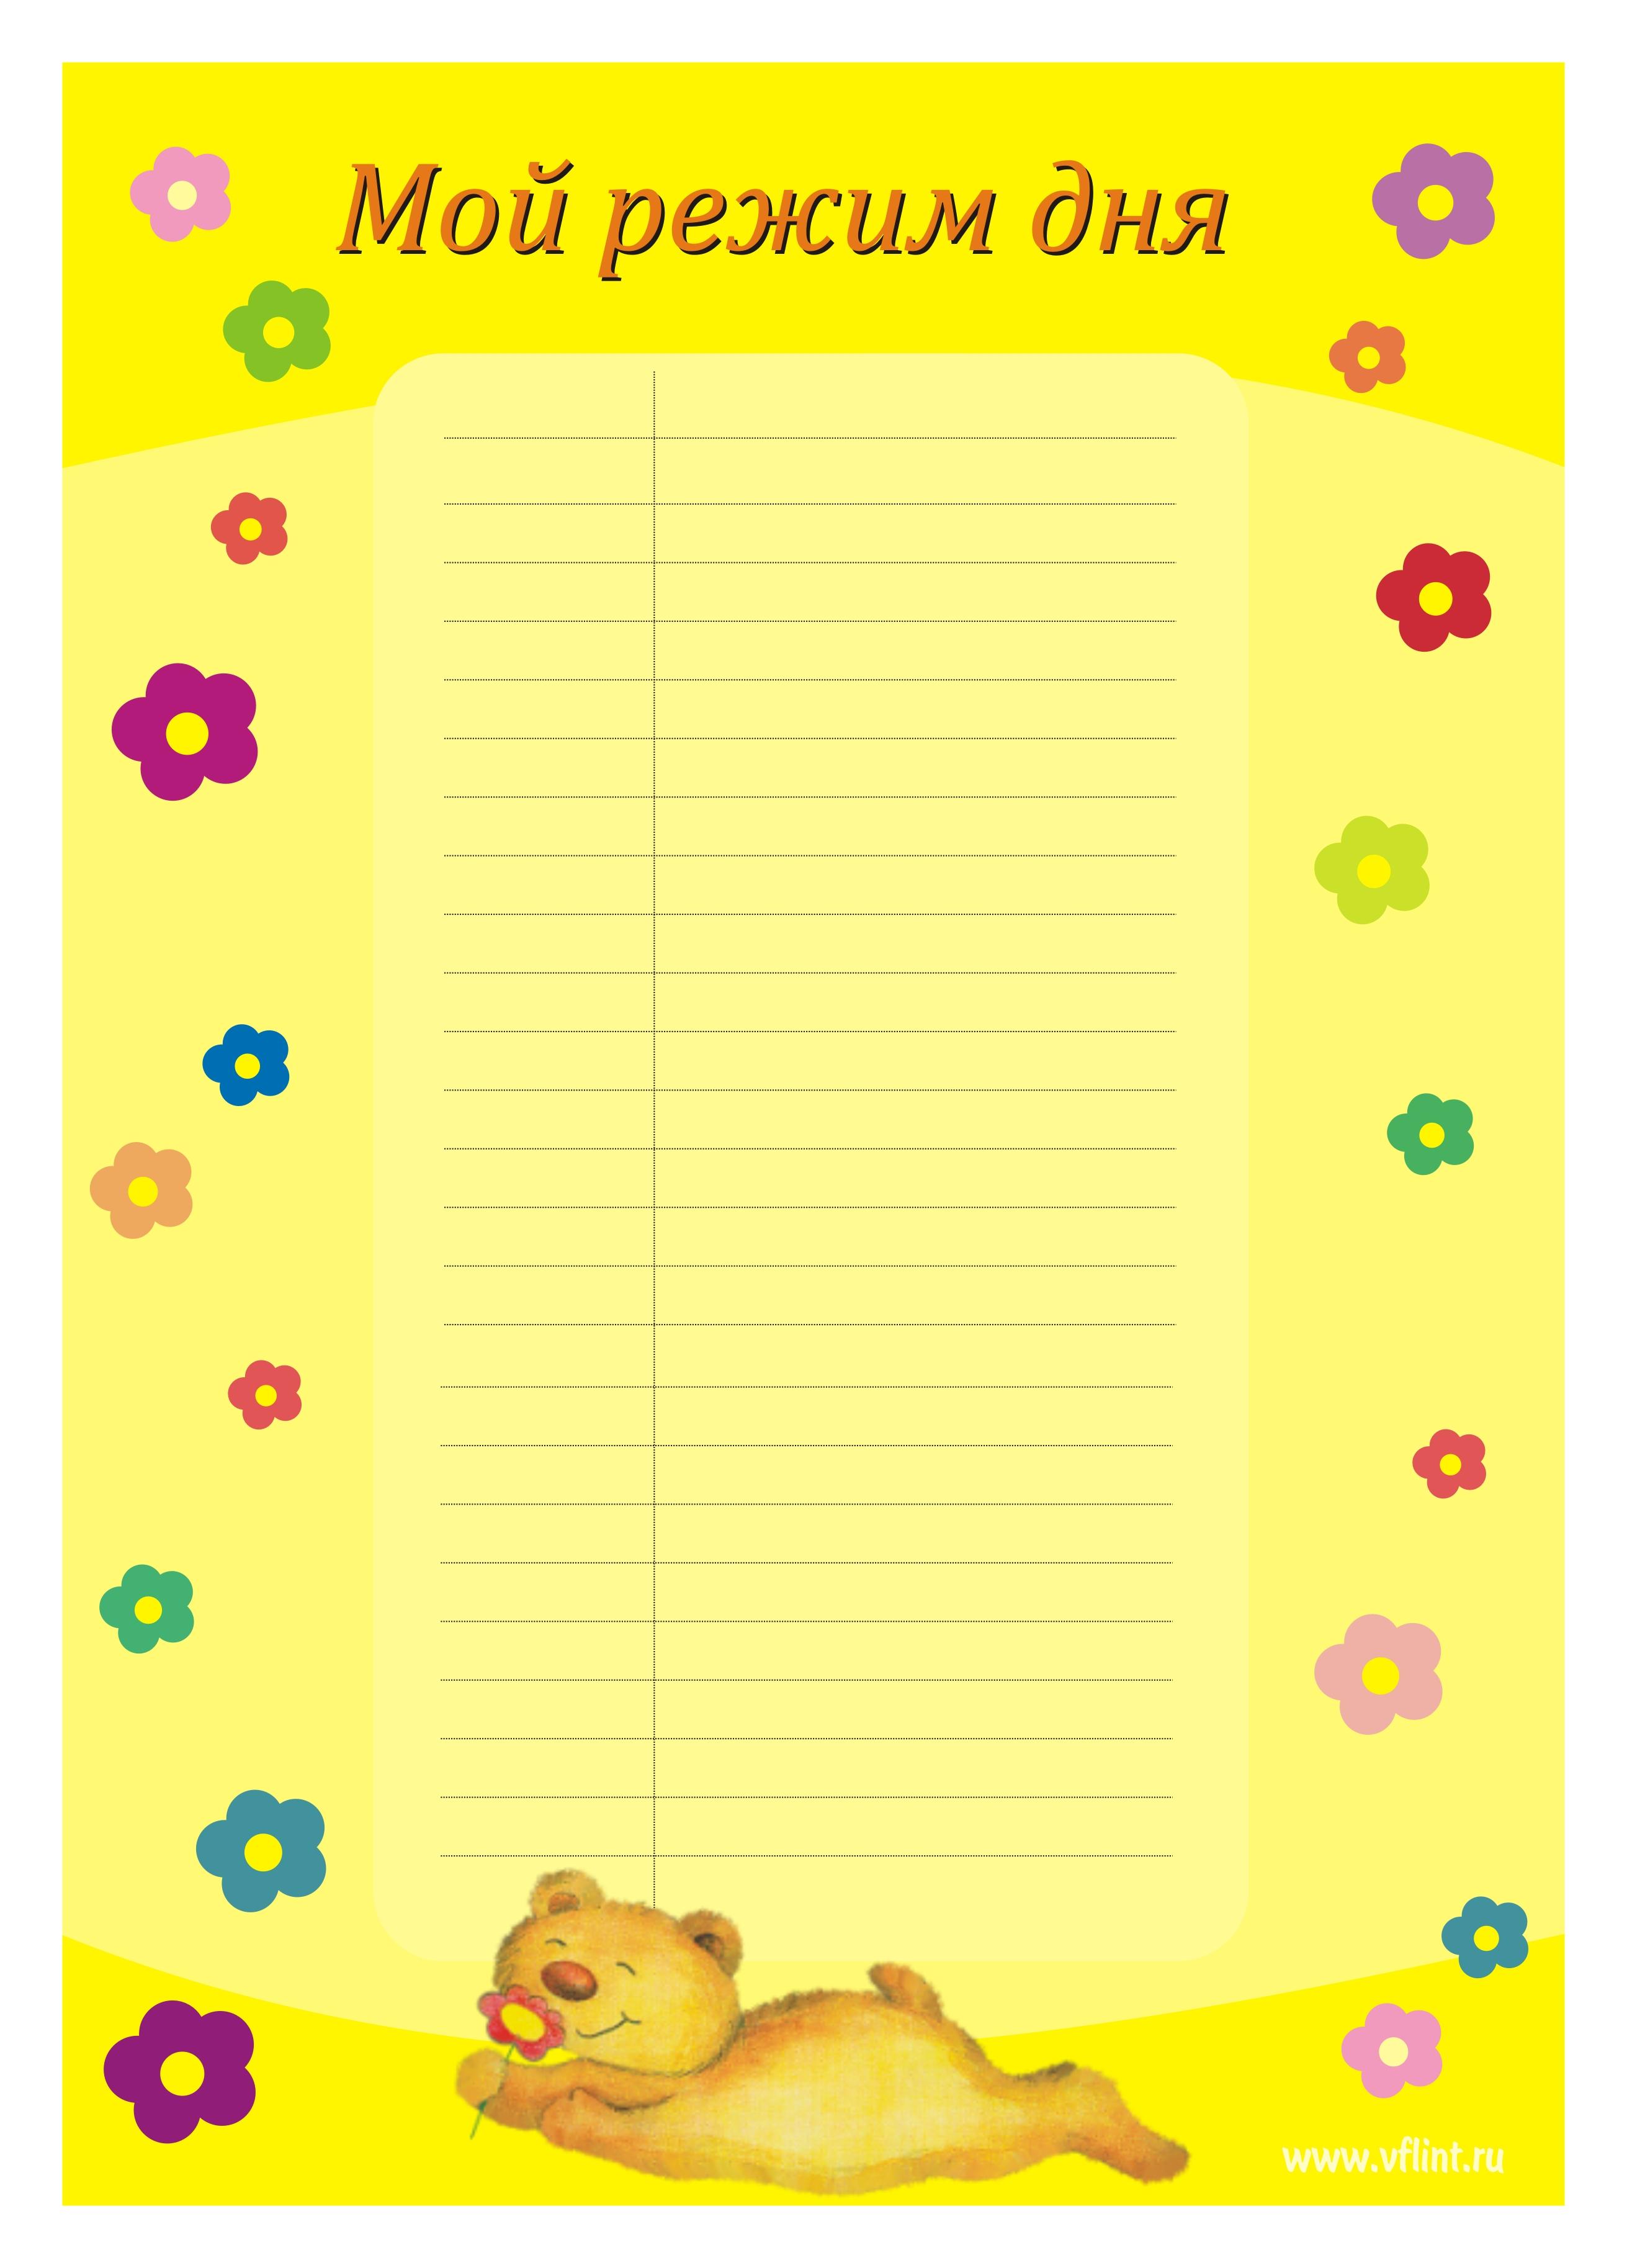 режим дня расписание шаблон